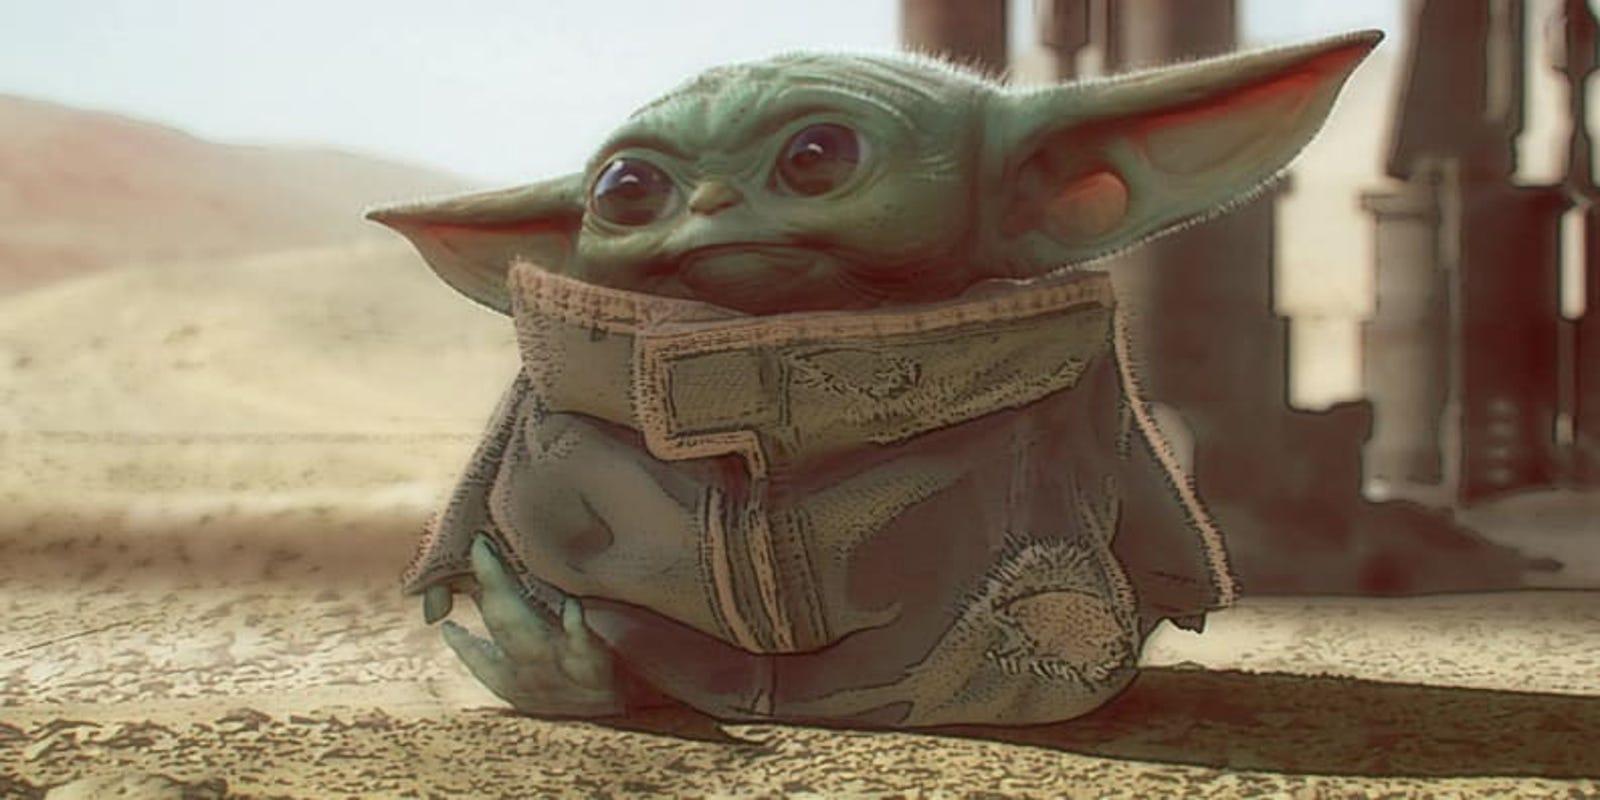 Reports: Build-a-Bear Workshop will debut 'The Mandalorian' Baby Yoda plush